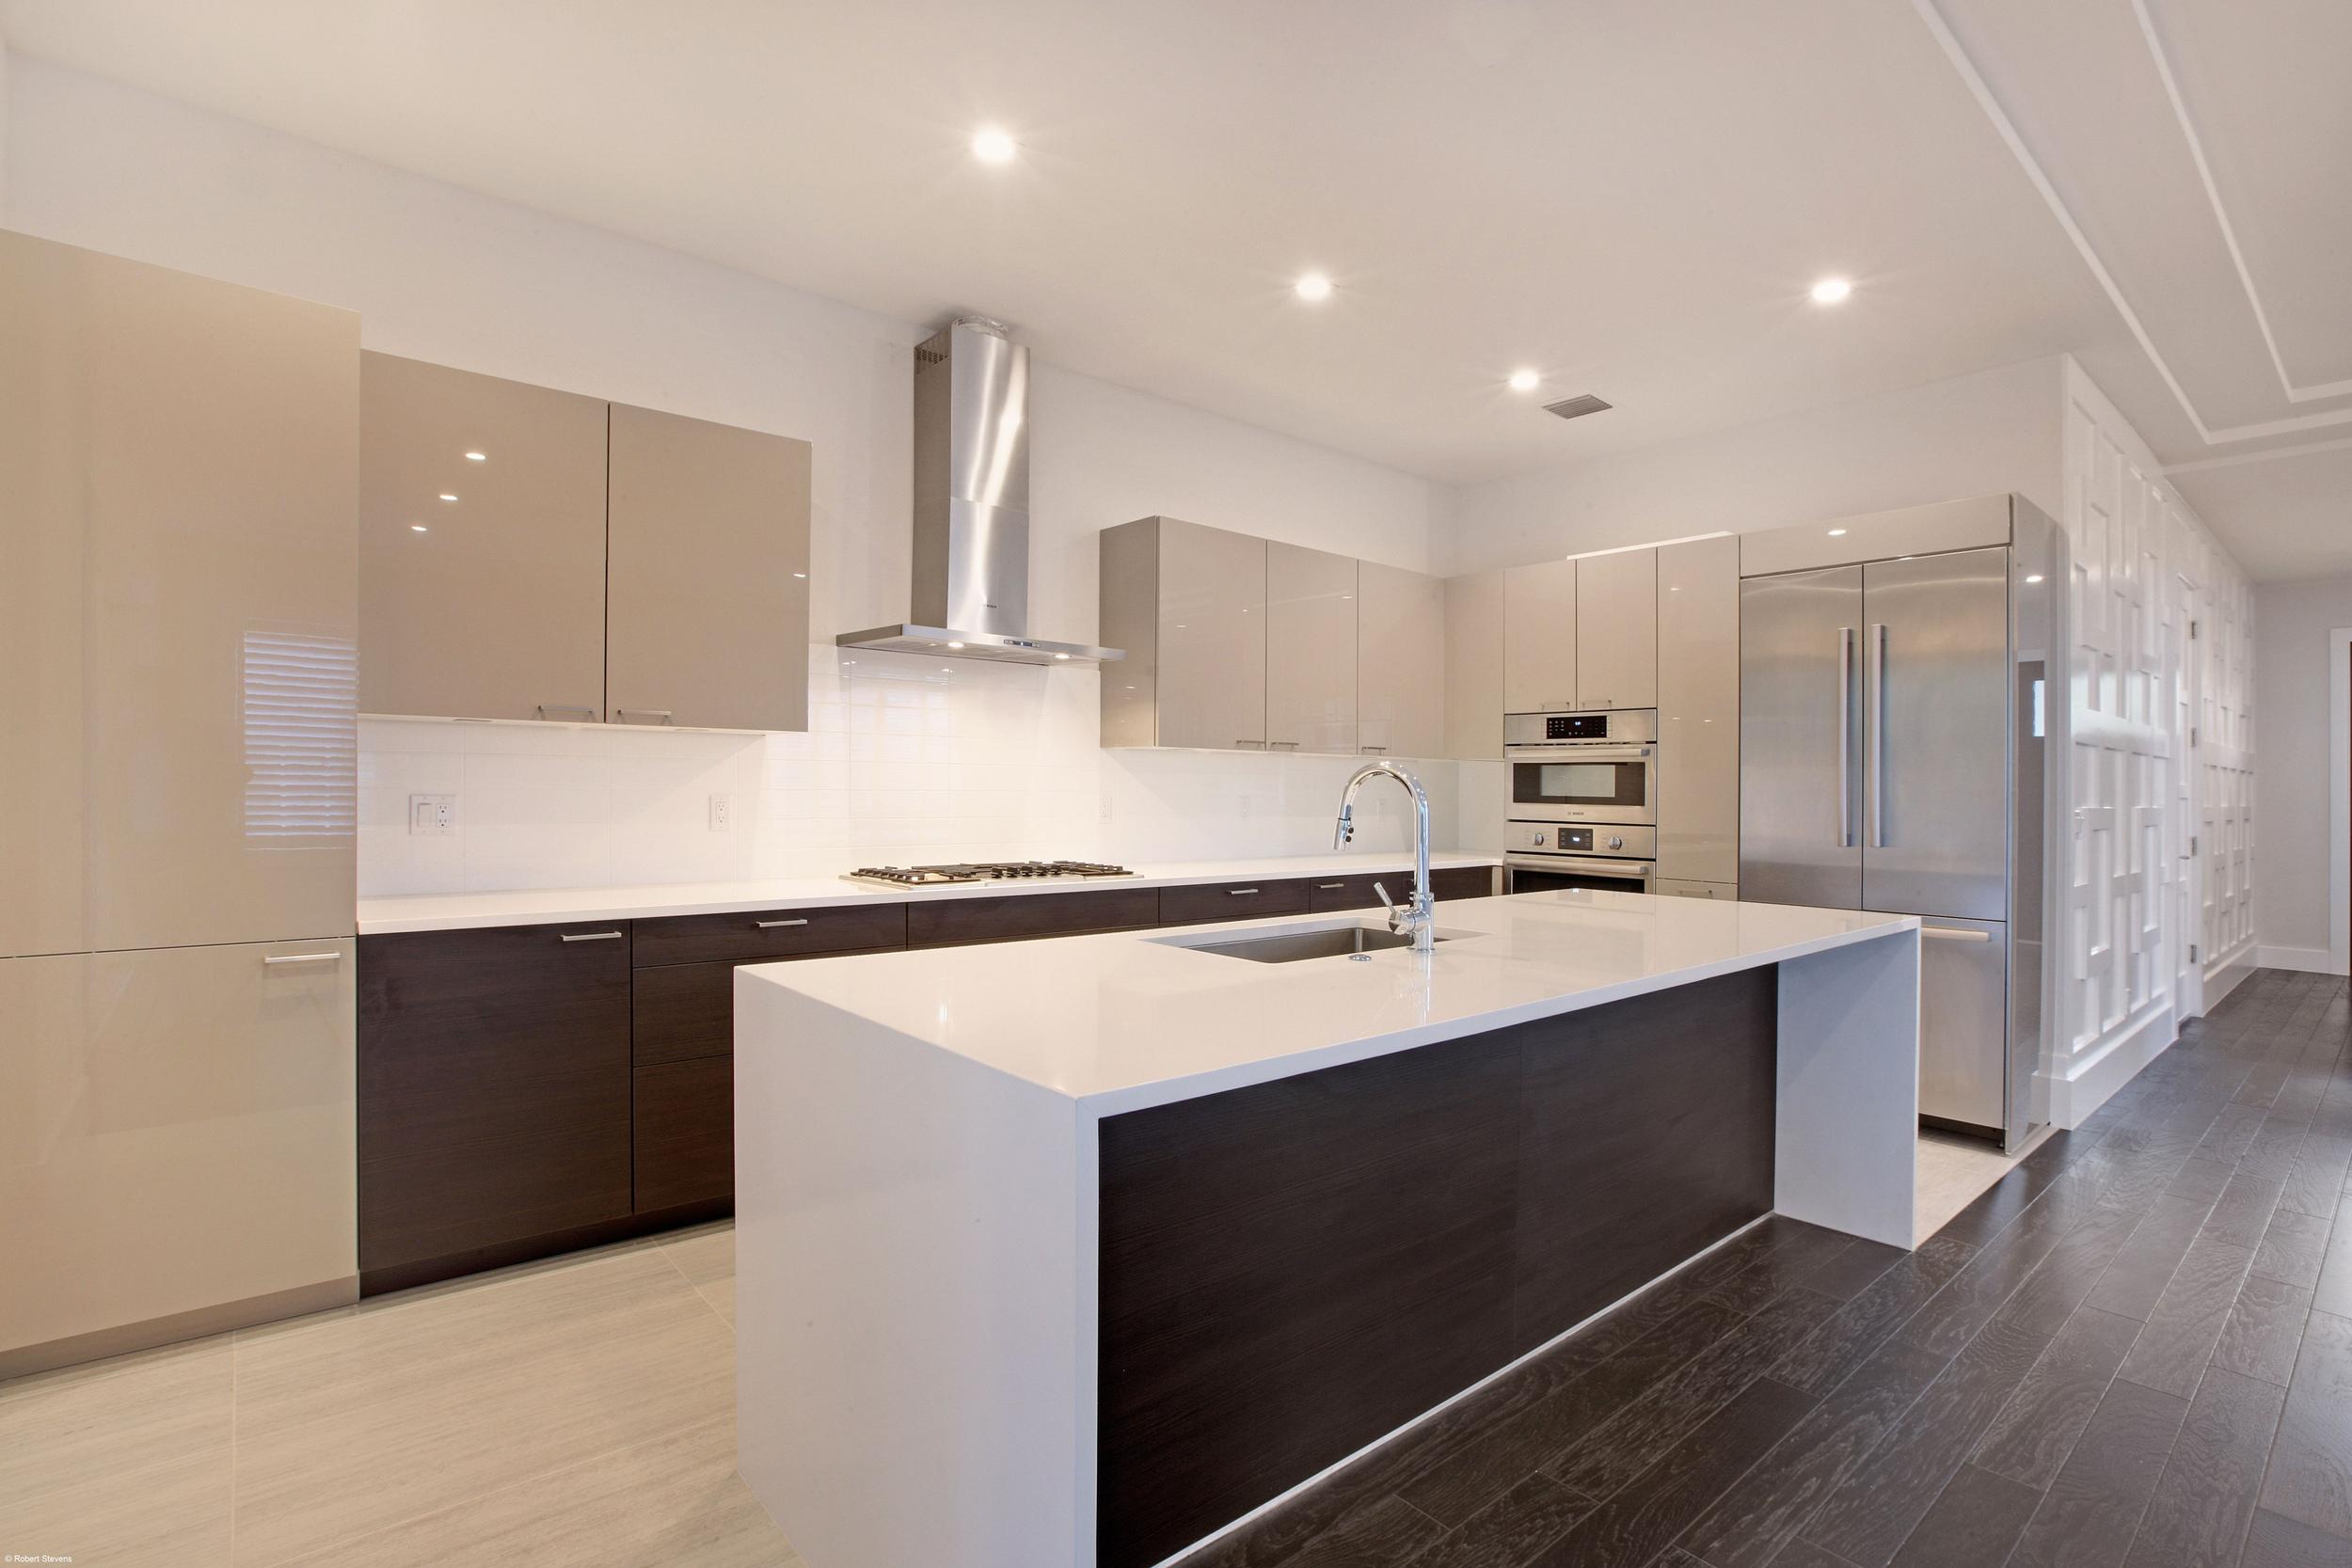 Kitchen Designer South Florida